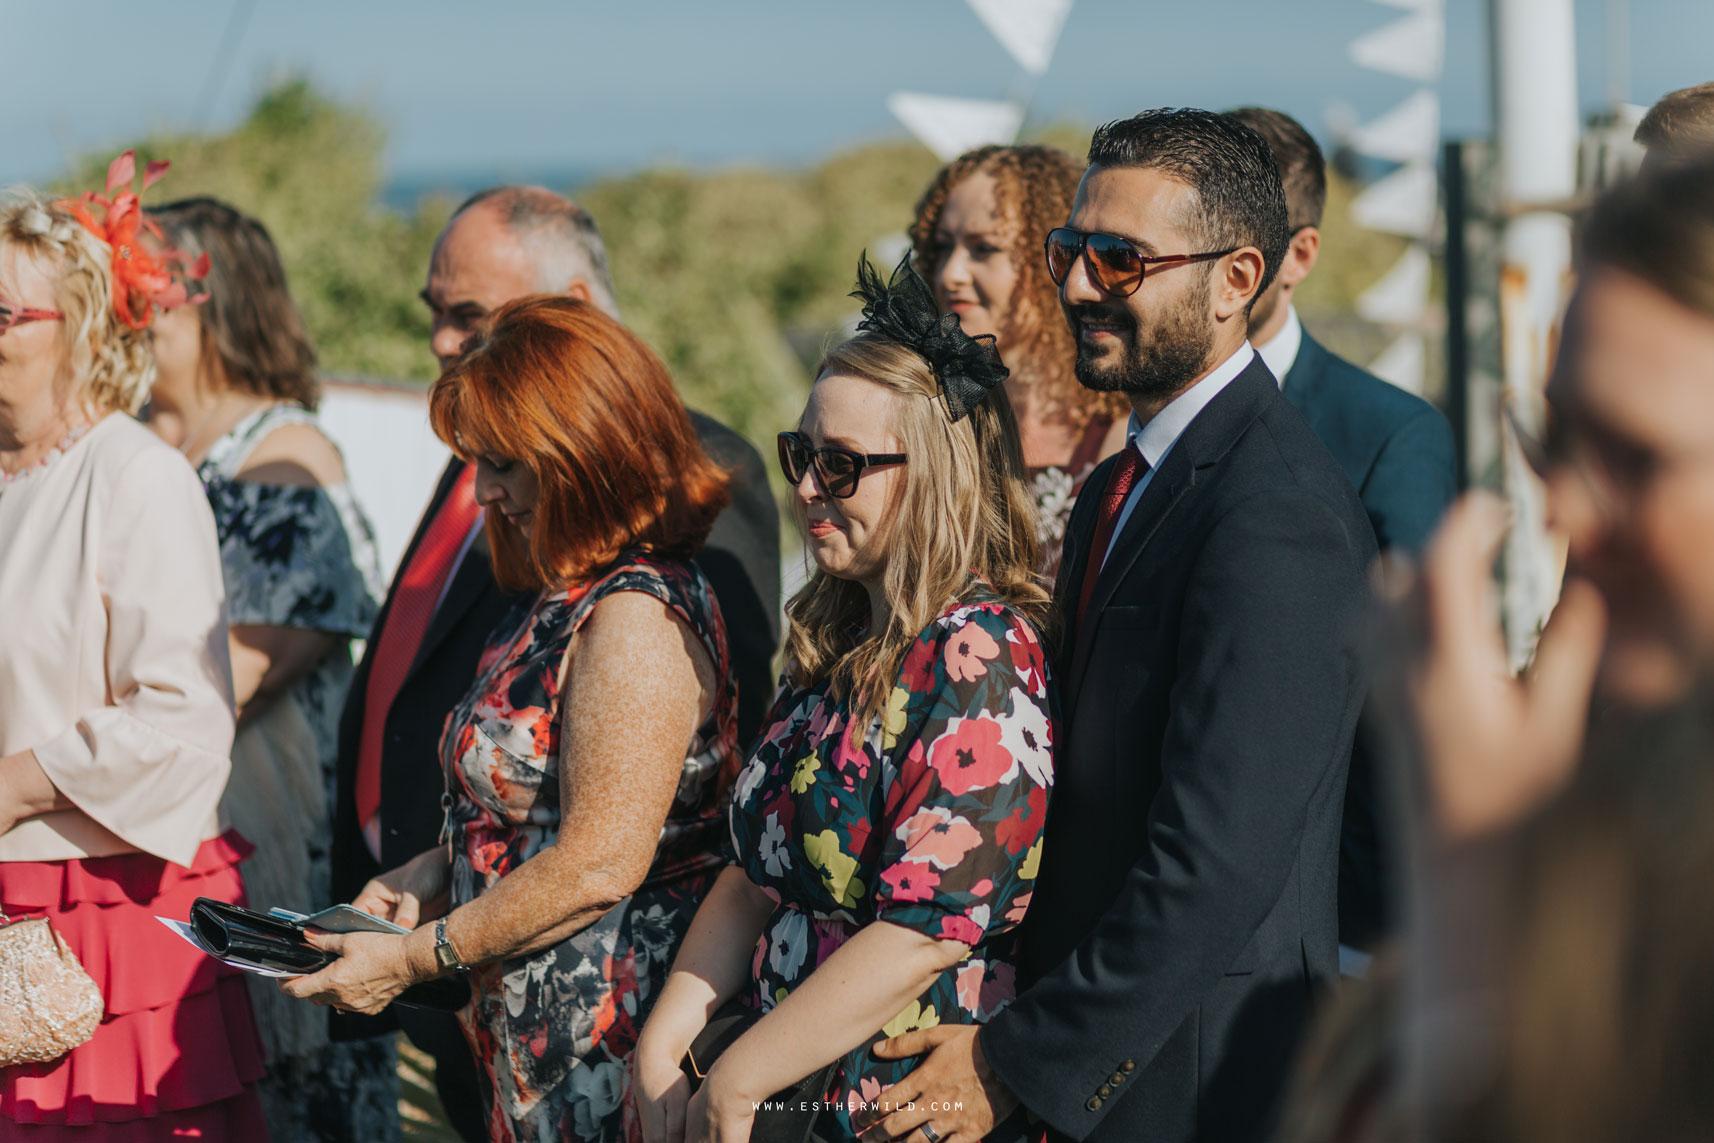 Cromer_Wedding_Beach_Outdoor_Ceremony_Norfolk_North_Lodge_Registry_Office_Rocket_House_Cafe_Cromer_Pier_IMG_3755_IMGL7948.jpg